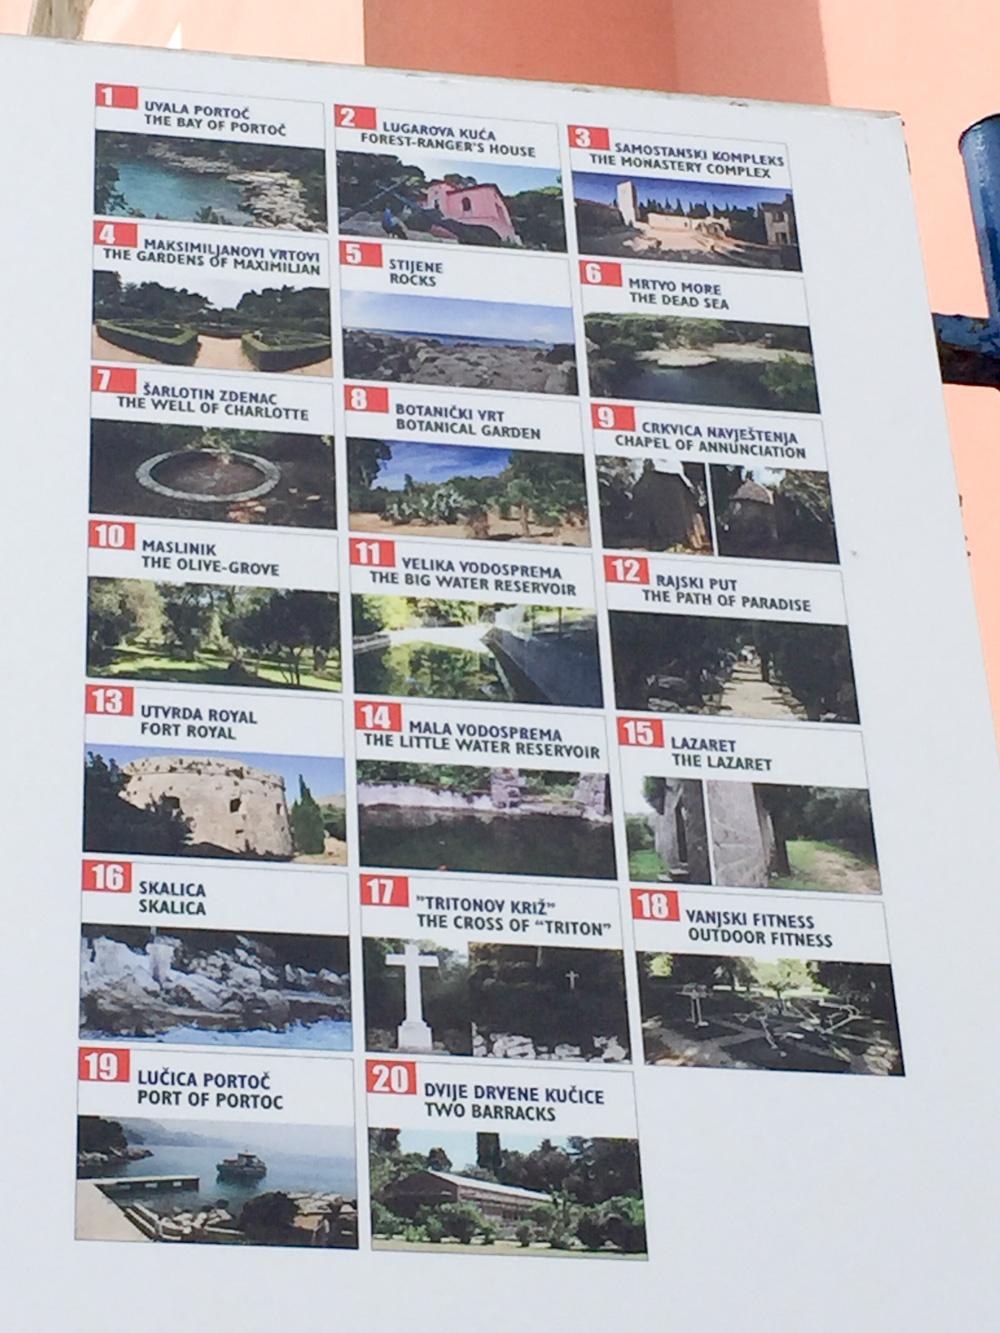 Dubrovnik-20.jpg